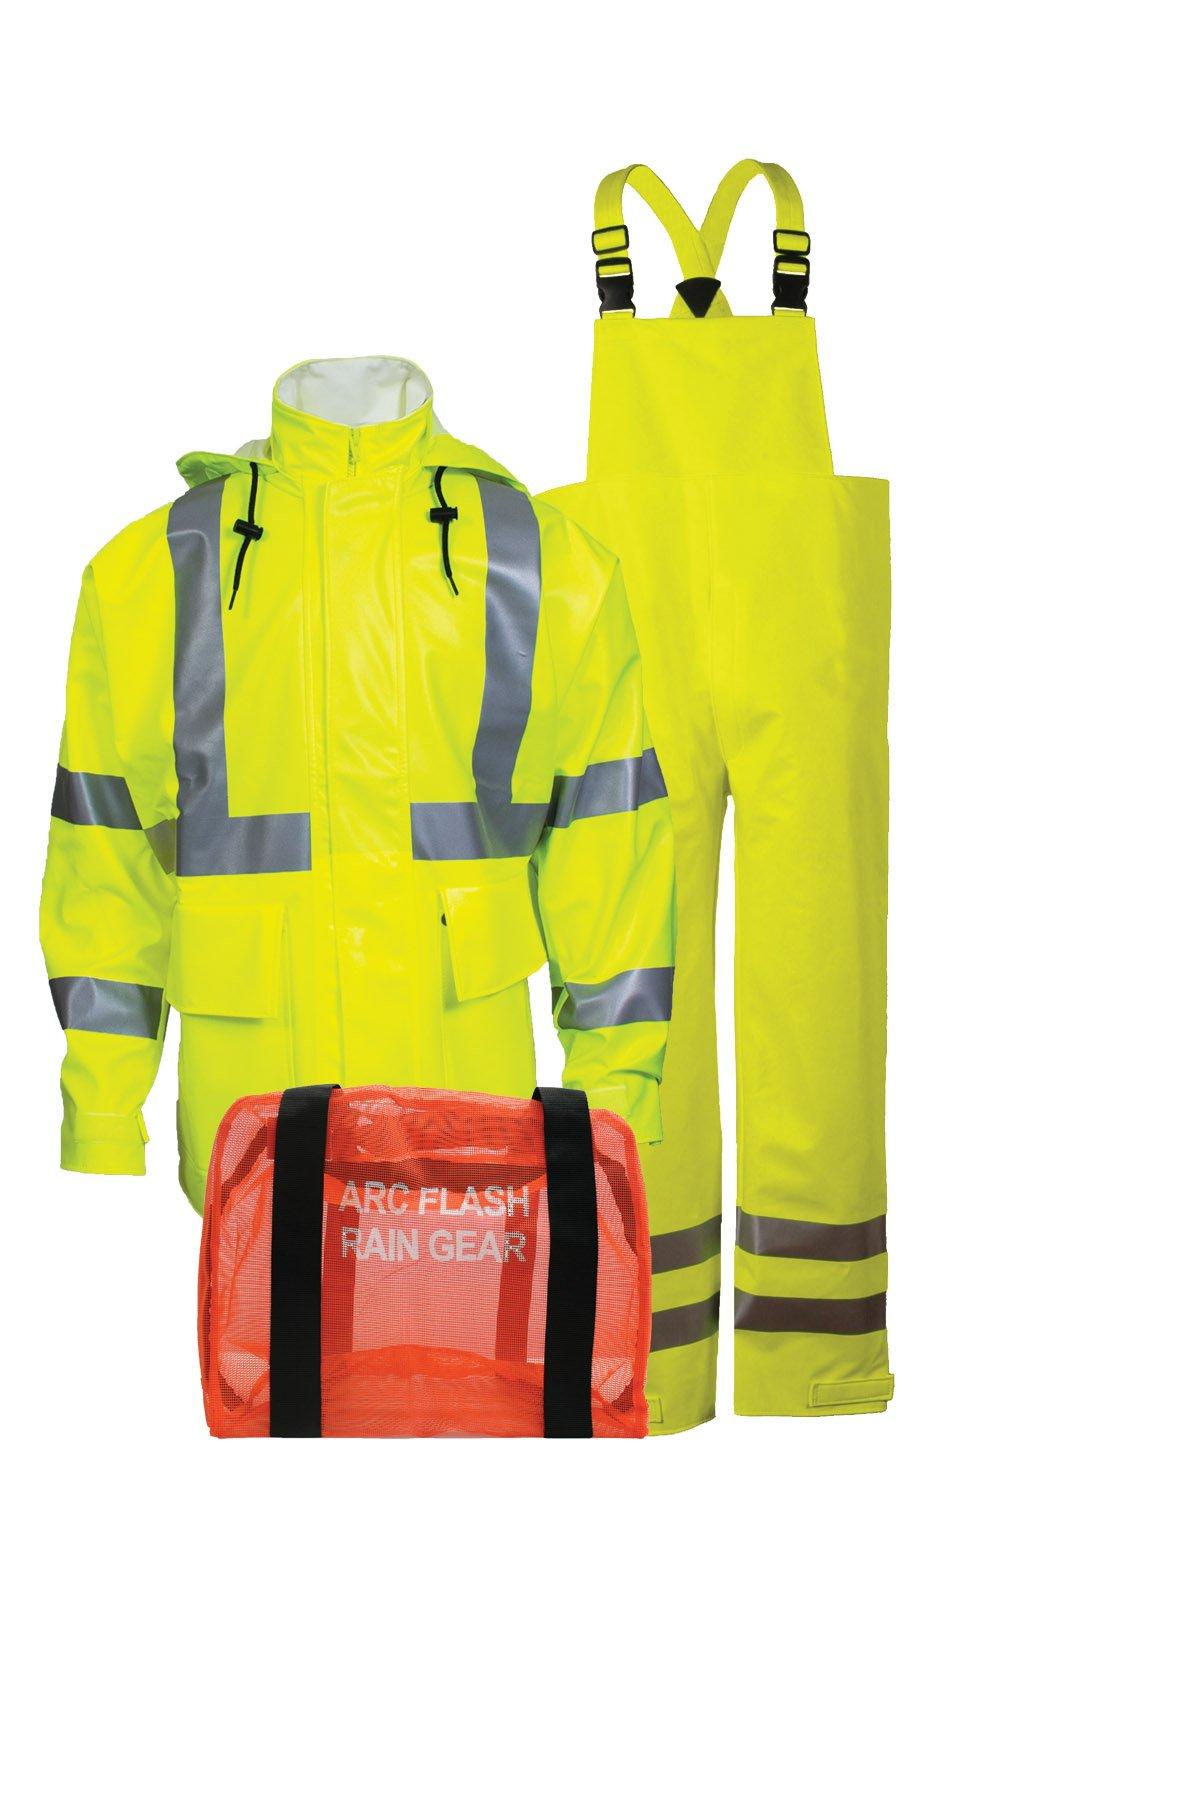 National Safety Apparel KITRLC32X 3 Piece Arc Rated Rainwear Jacket, Bib Pant and Mesh Gear Bag Kit, Class 3, 2X-Large, Fluorescent Yellow